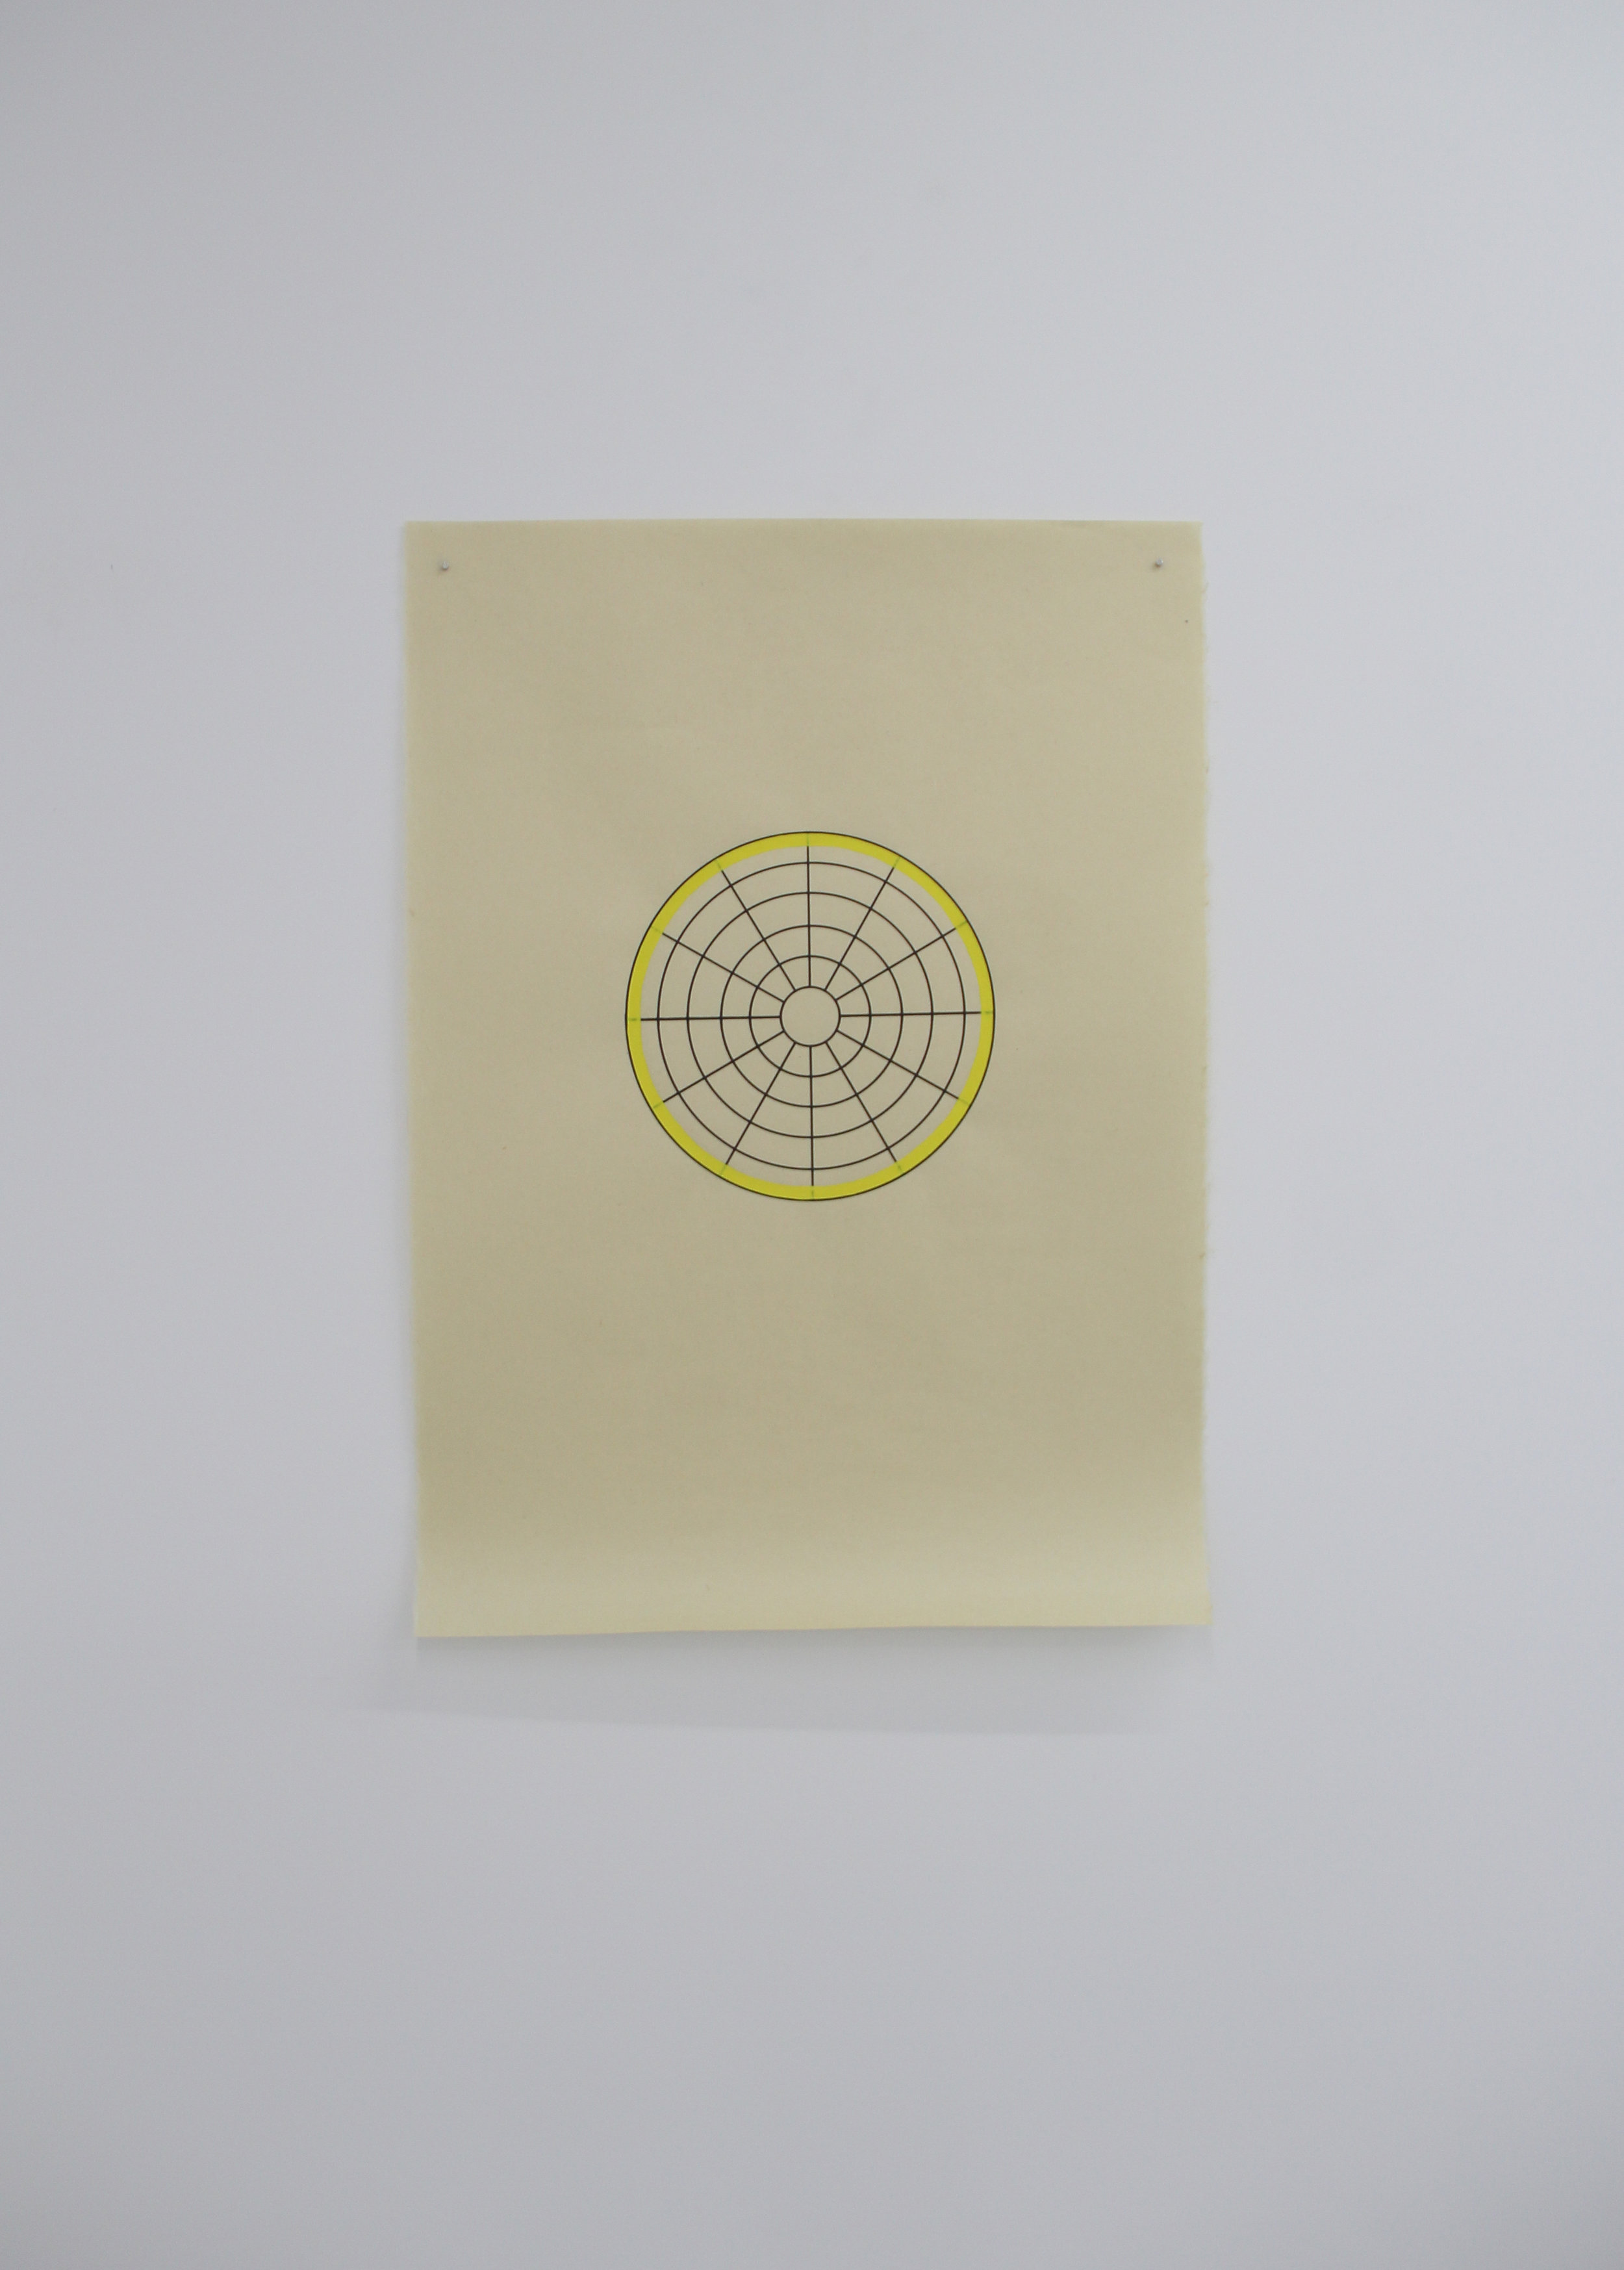 Antonin Gerson,  Jaune - Omnidirectionnel,  Sérigraphie, gouache, 58x84cm, 2018